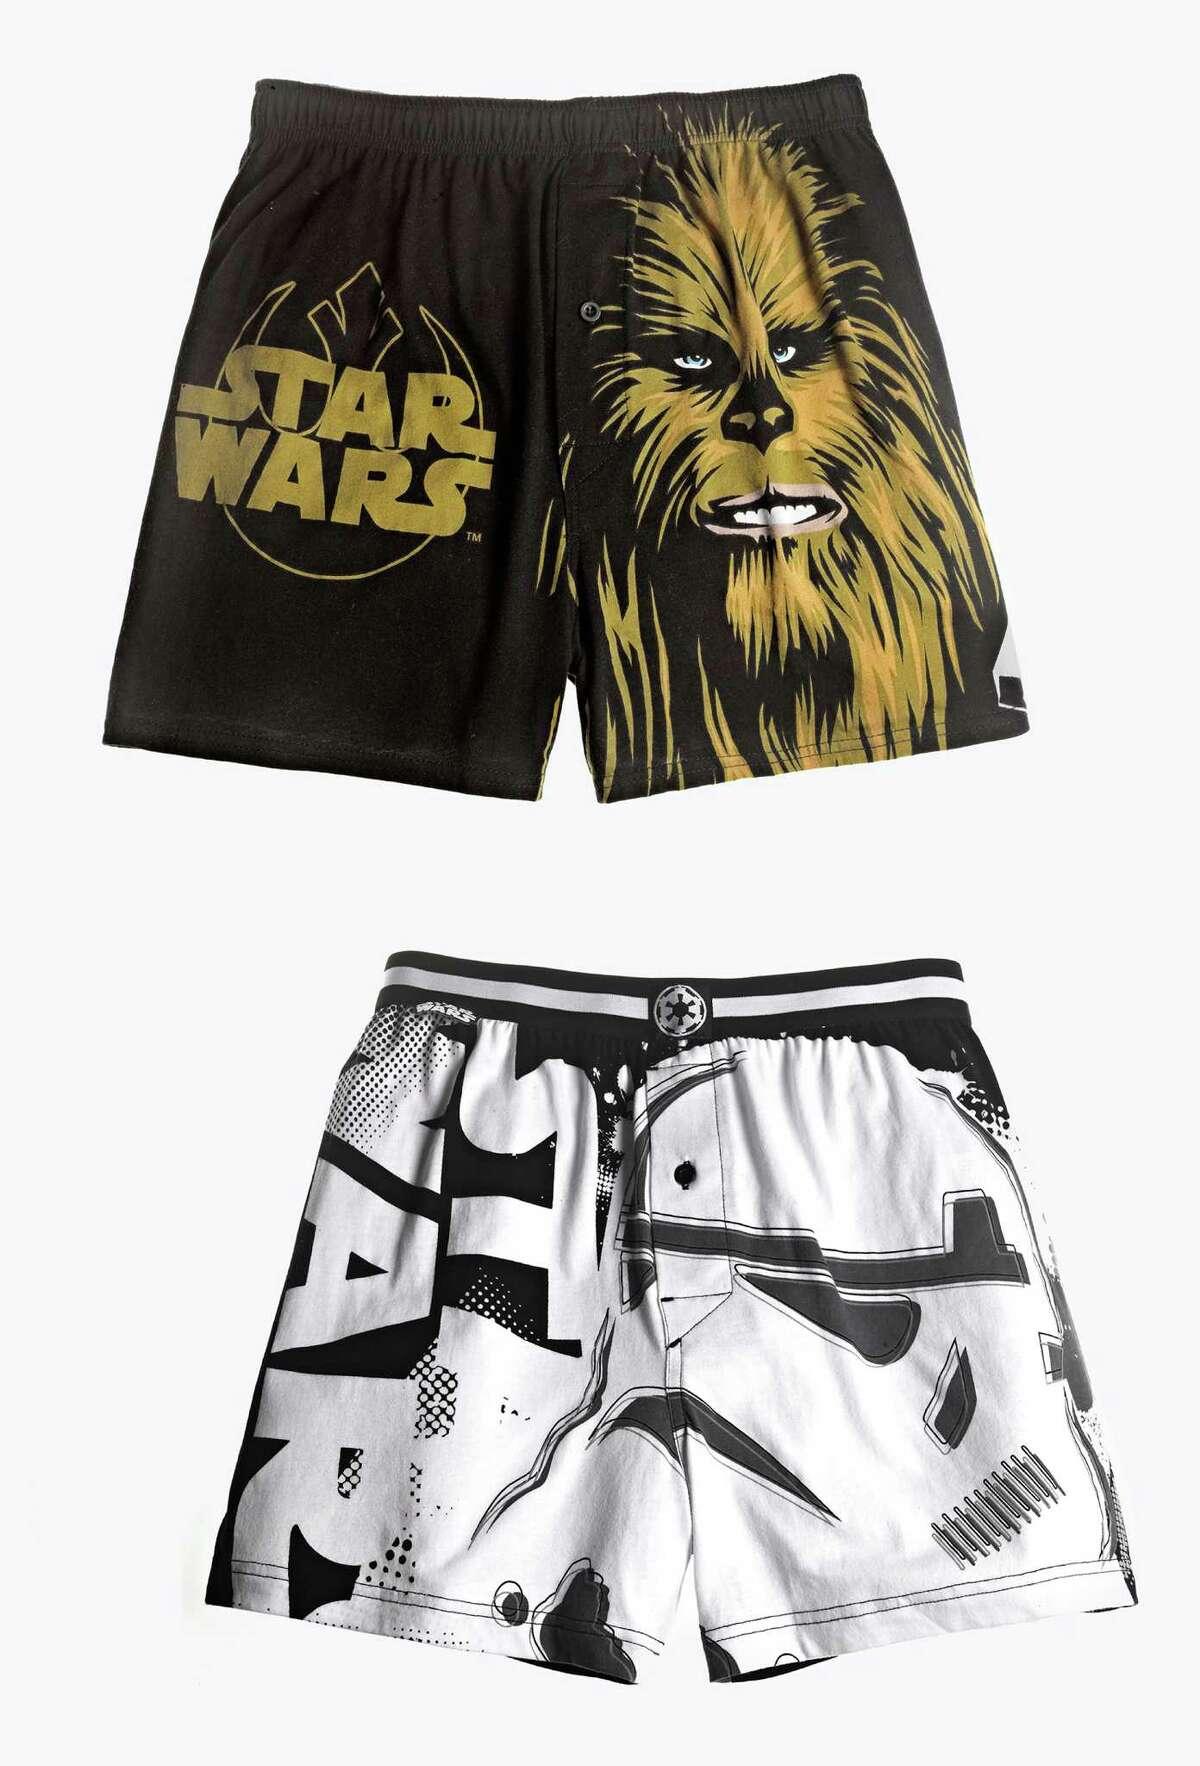 Bioworld 'Star Wars' Stormtrooper and Chewbacca Boxers: $14.99 each, macys.com.